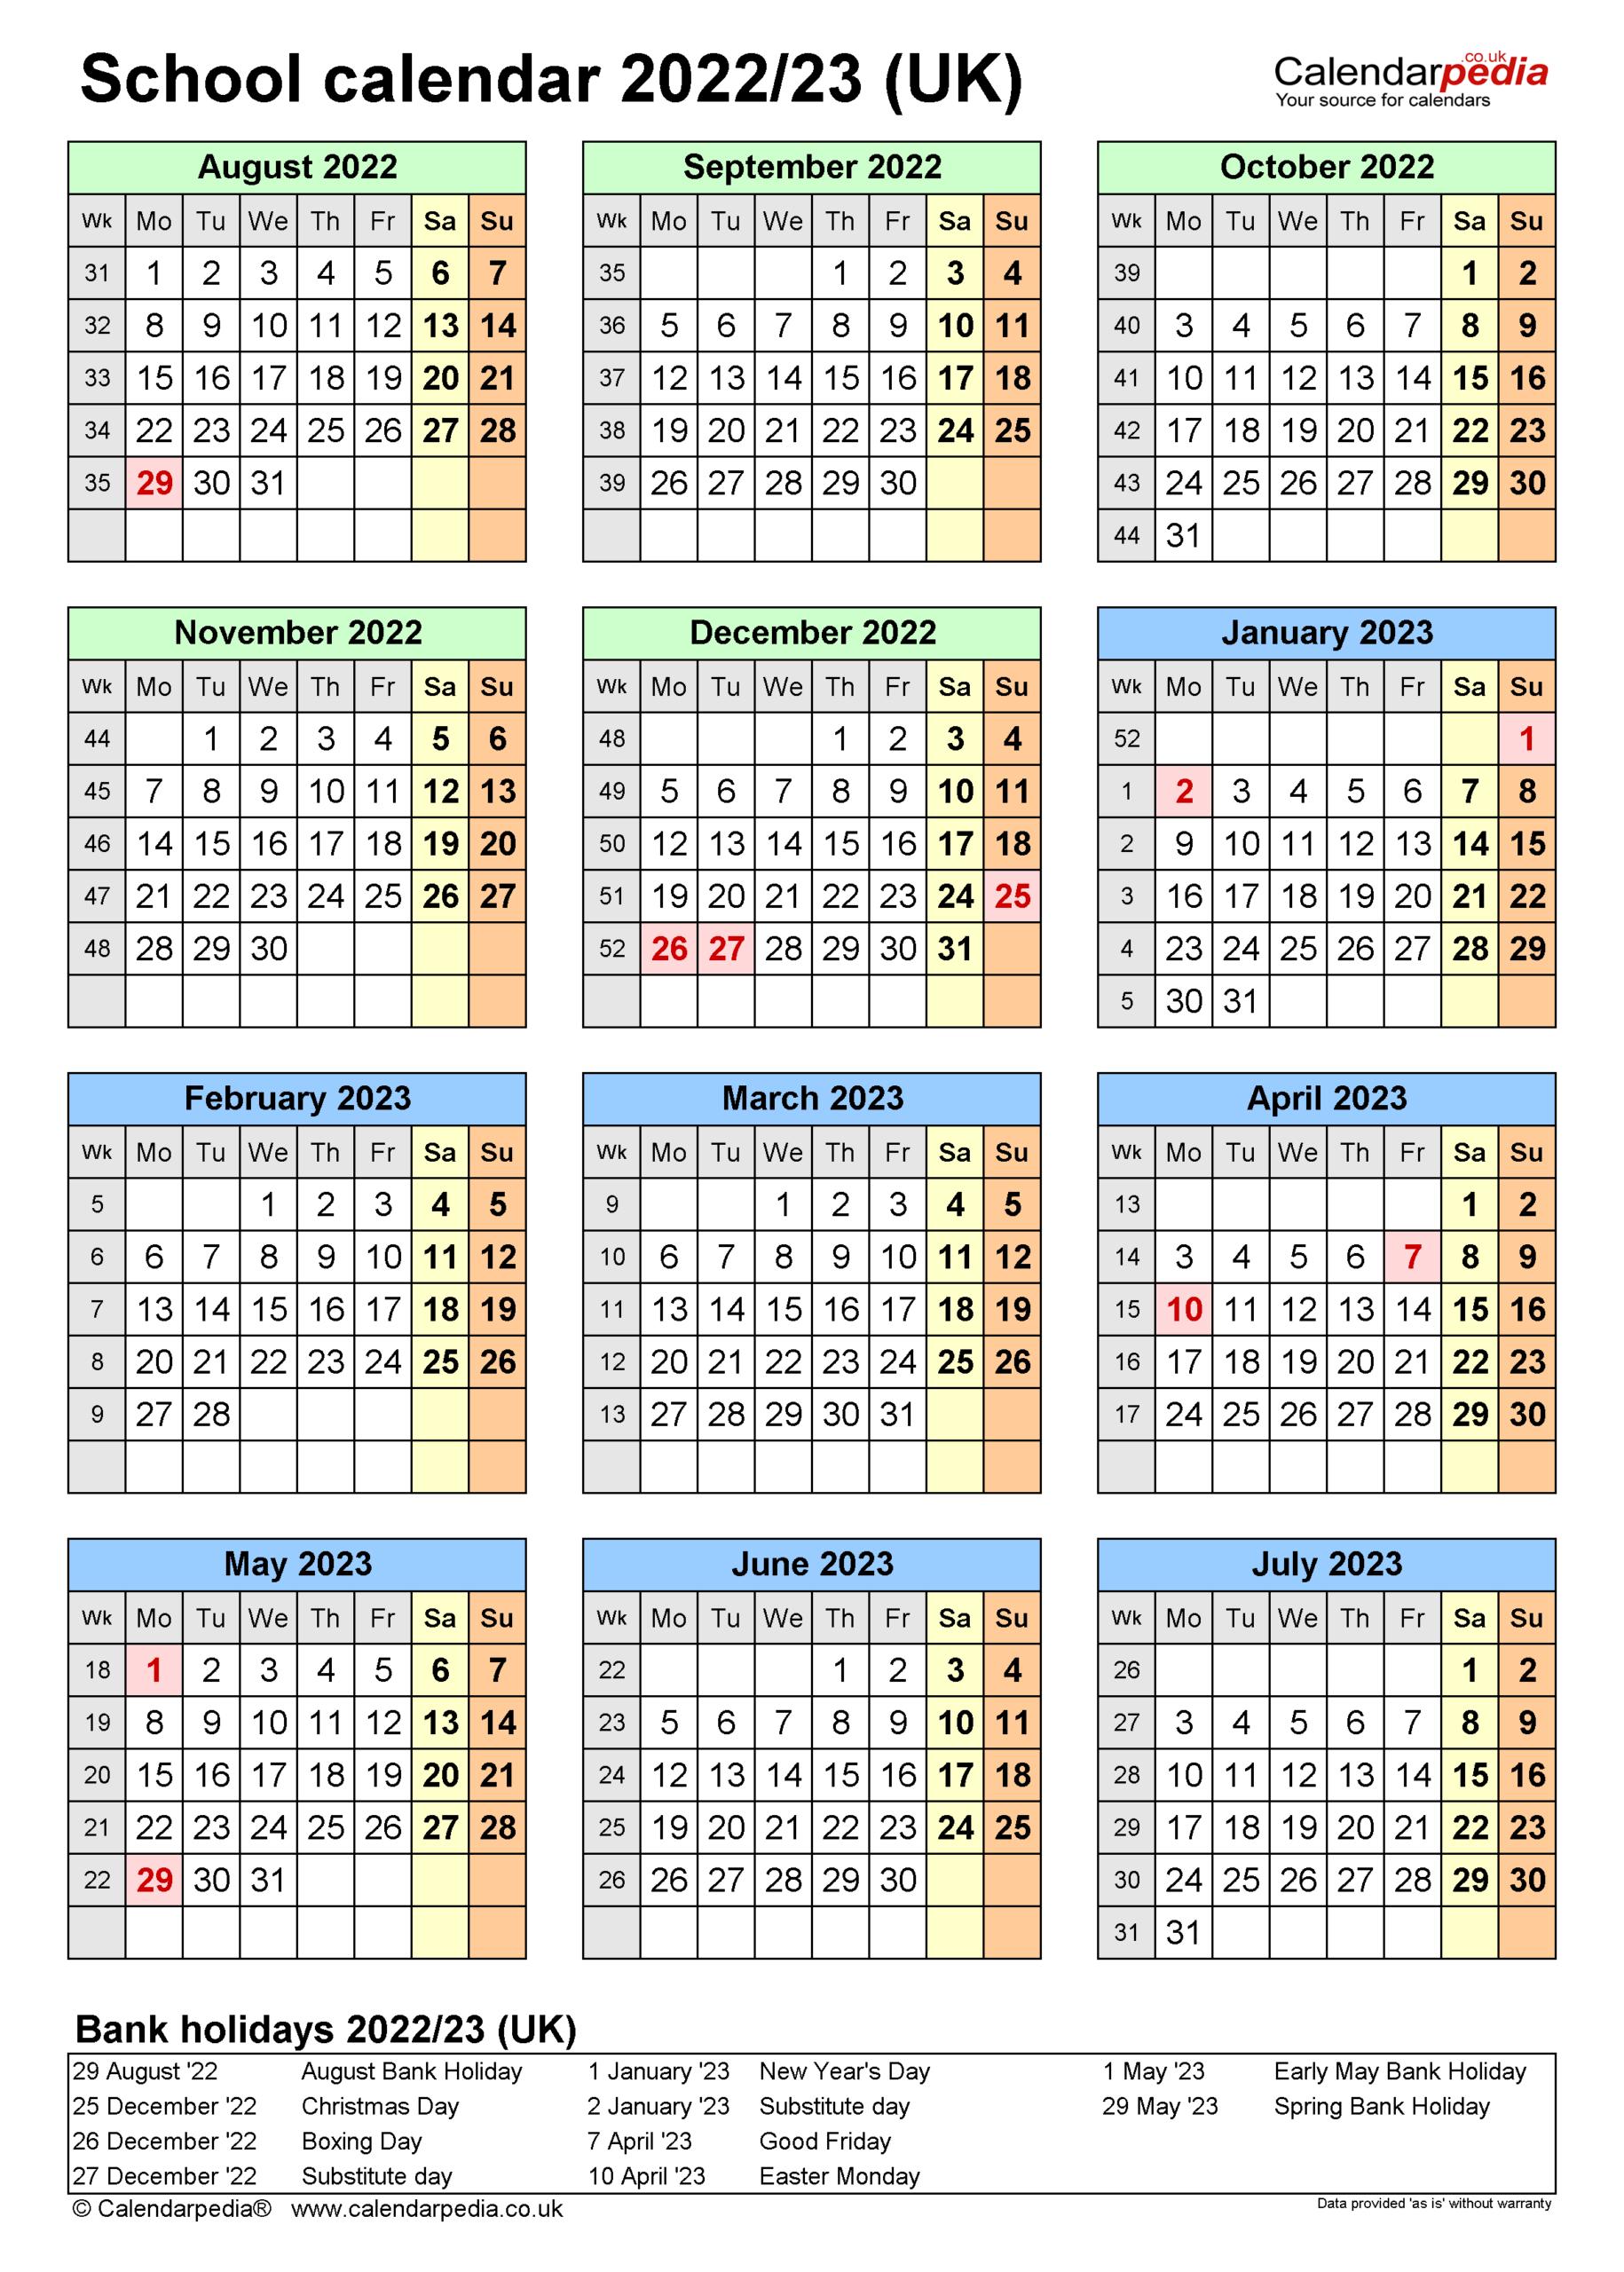 School Calendars 2022/2023 As Free Printable Word Templates with Aiken County 2022 2023 School Calendar